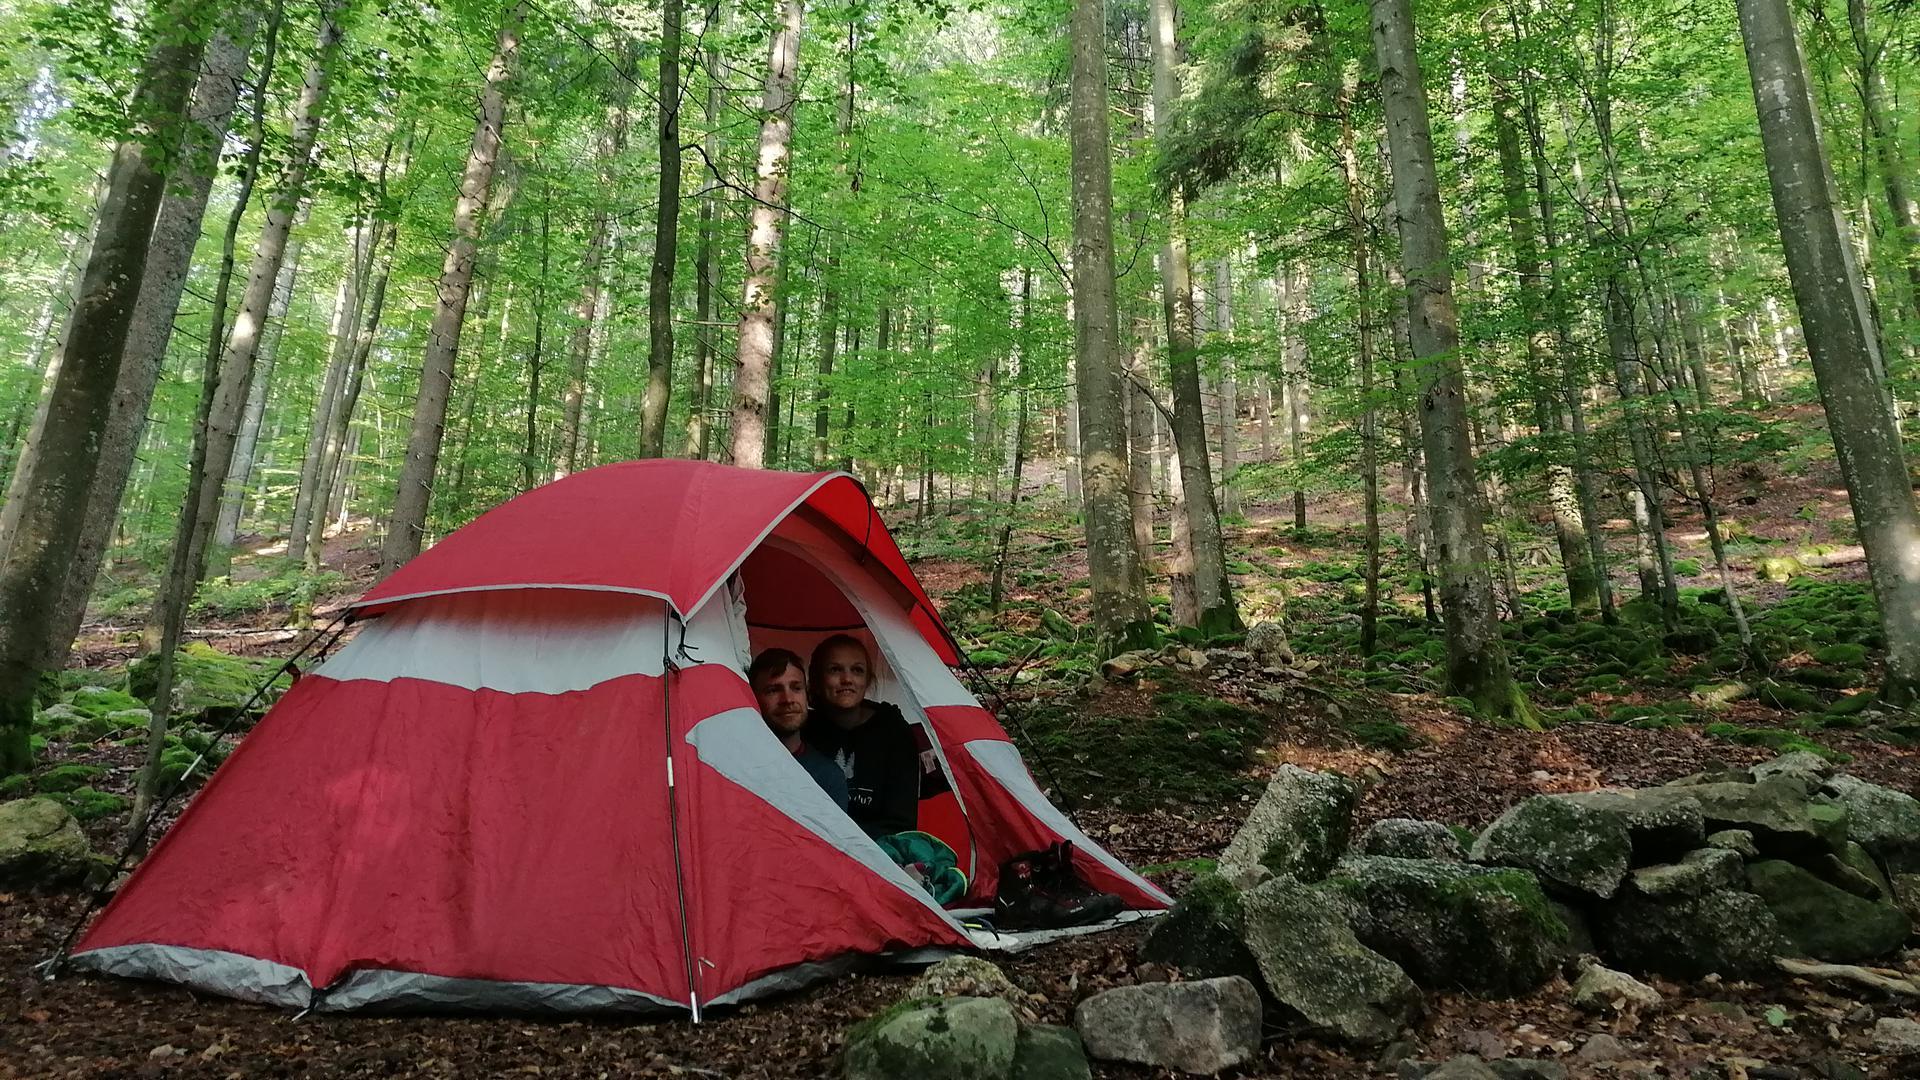 Zelt im Trekkingcamp Grimbach, aus dem zwei Personen herausschauen.